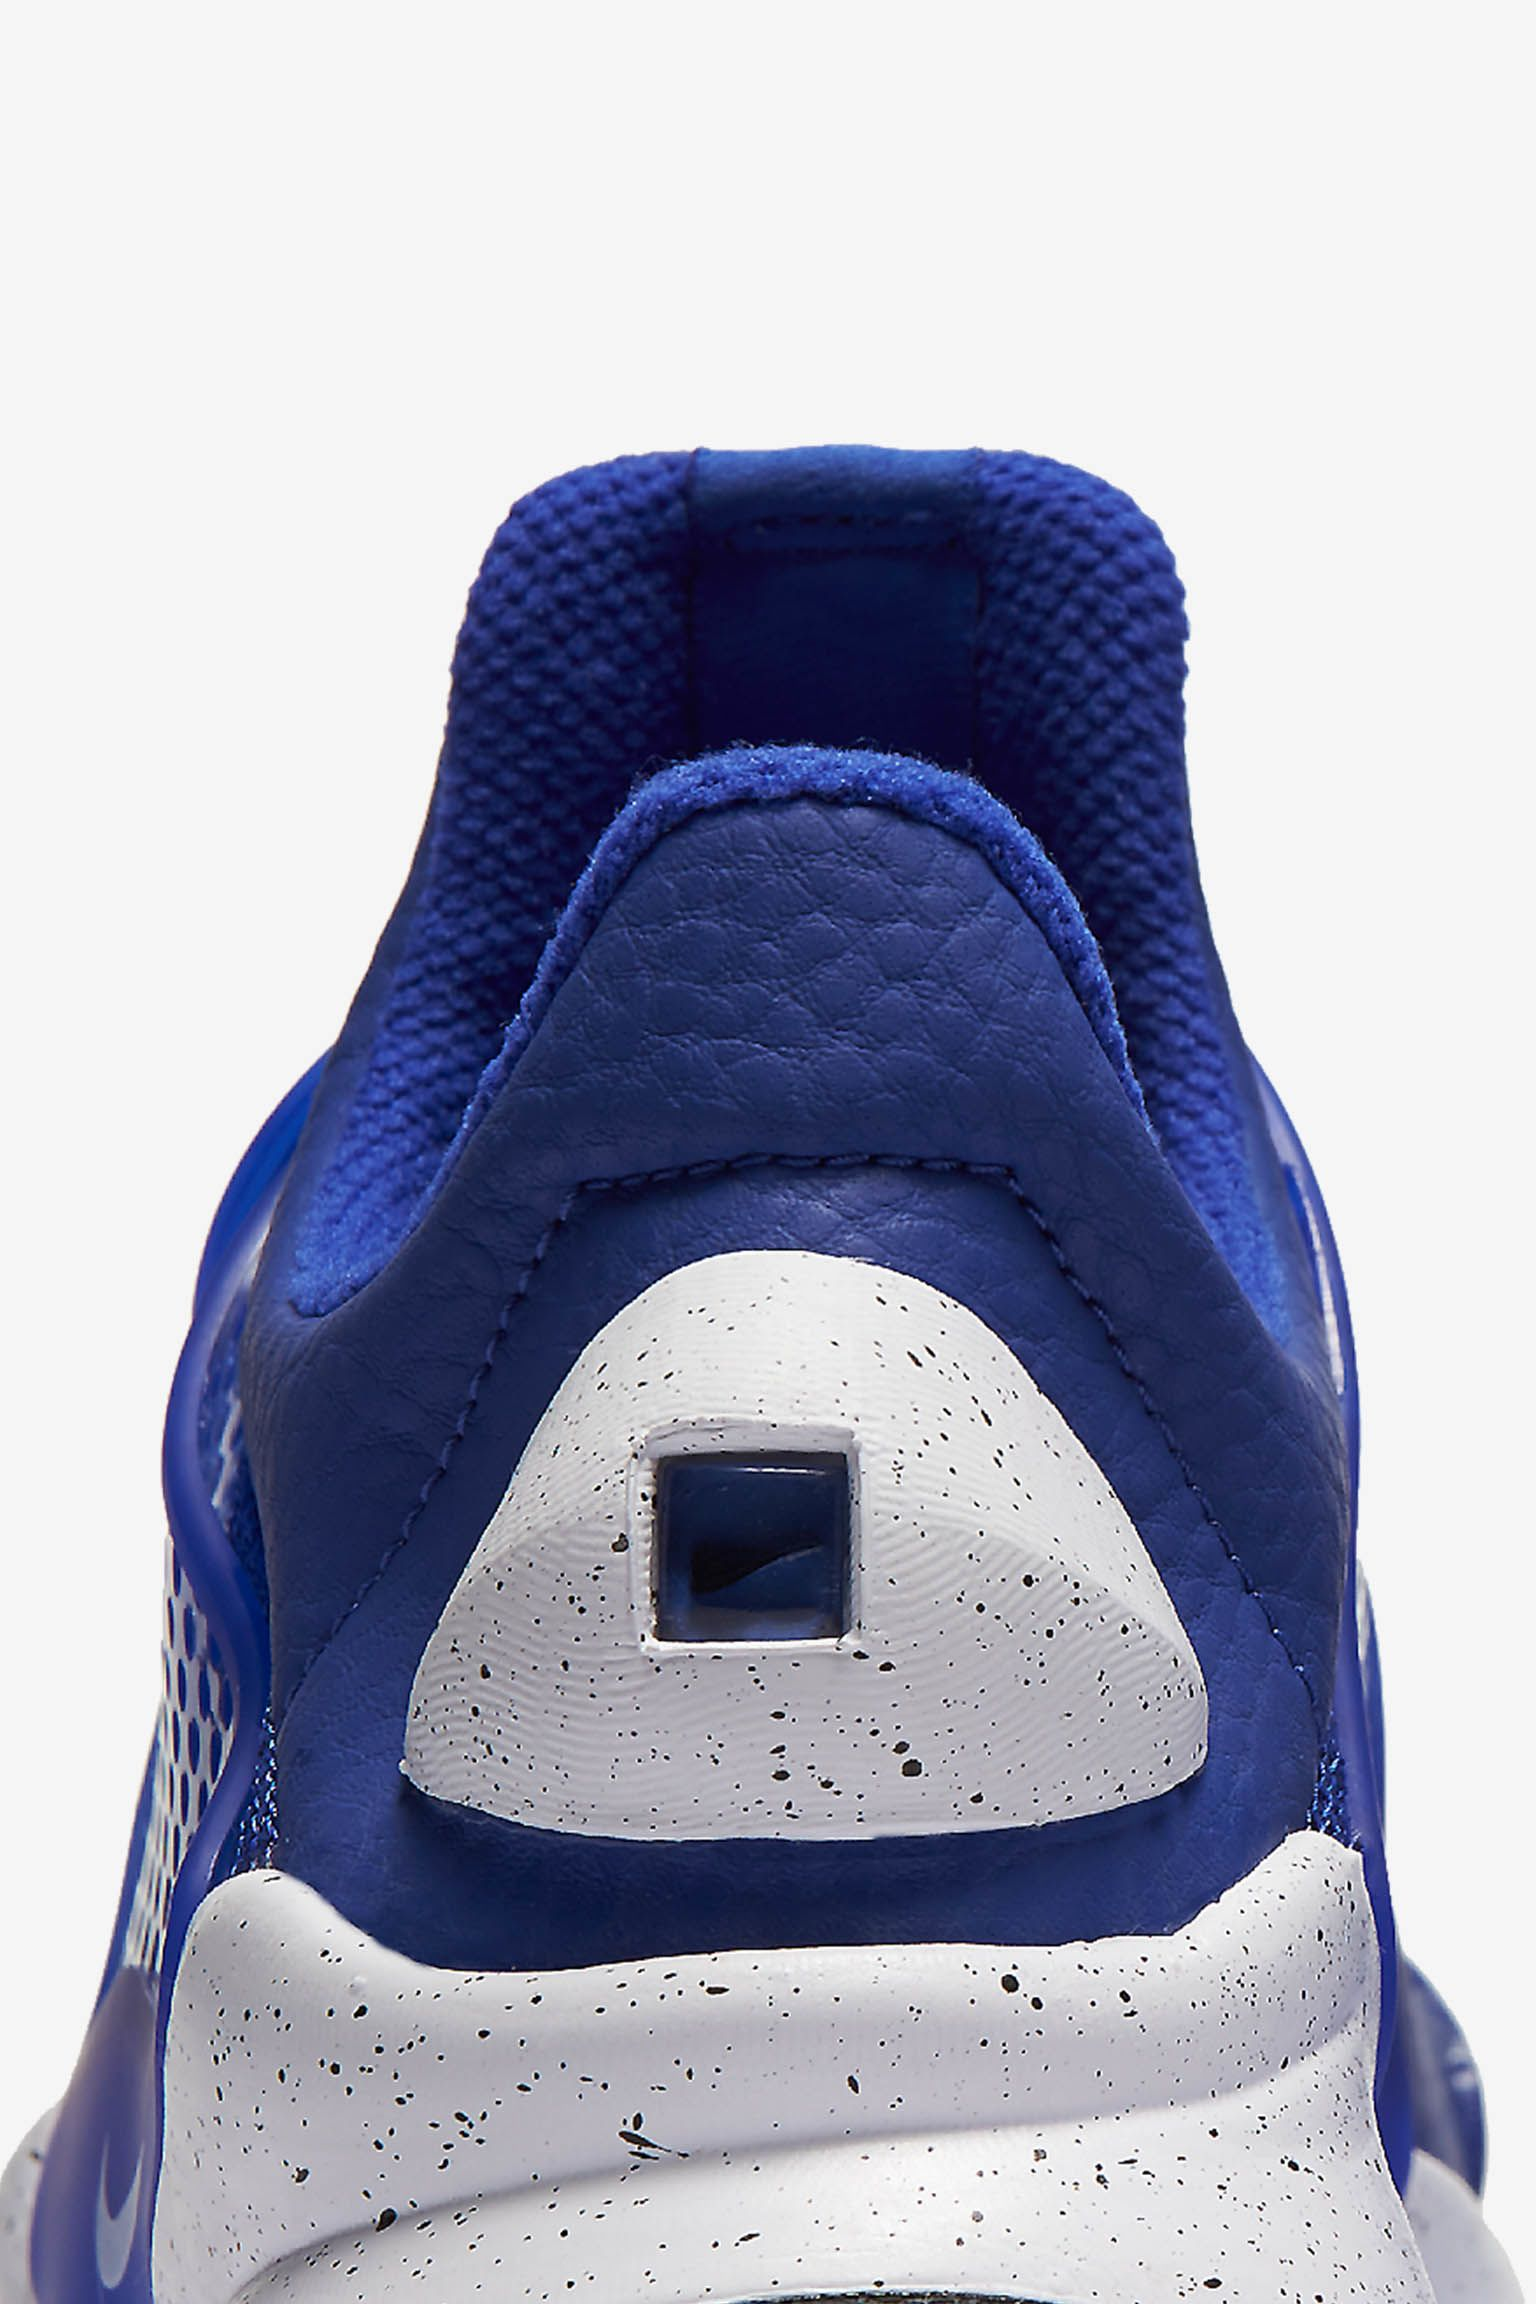 Women's Nike Sock Dart Premium 'Paramount Blue' 2017